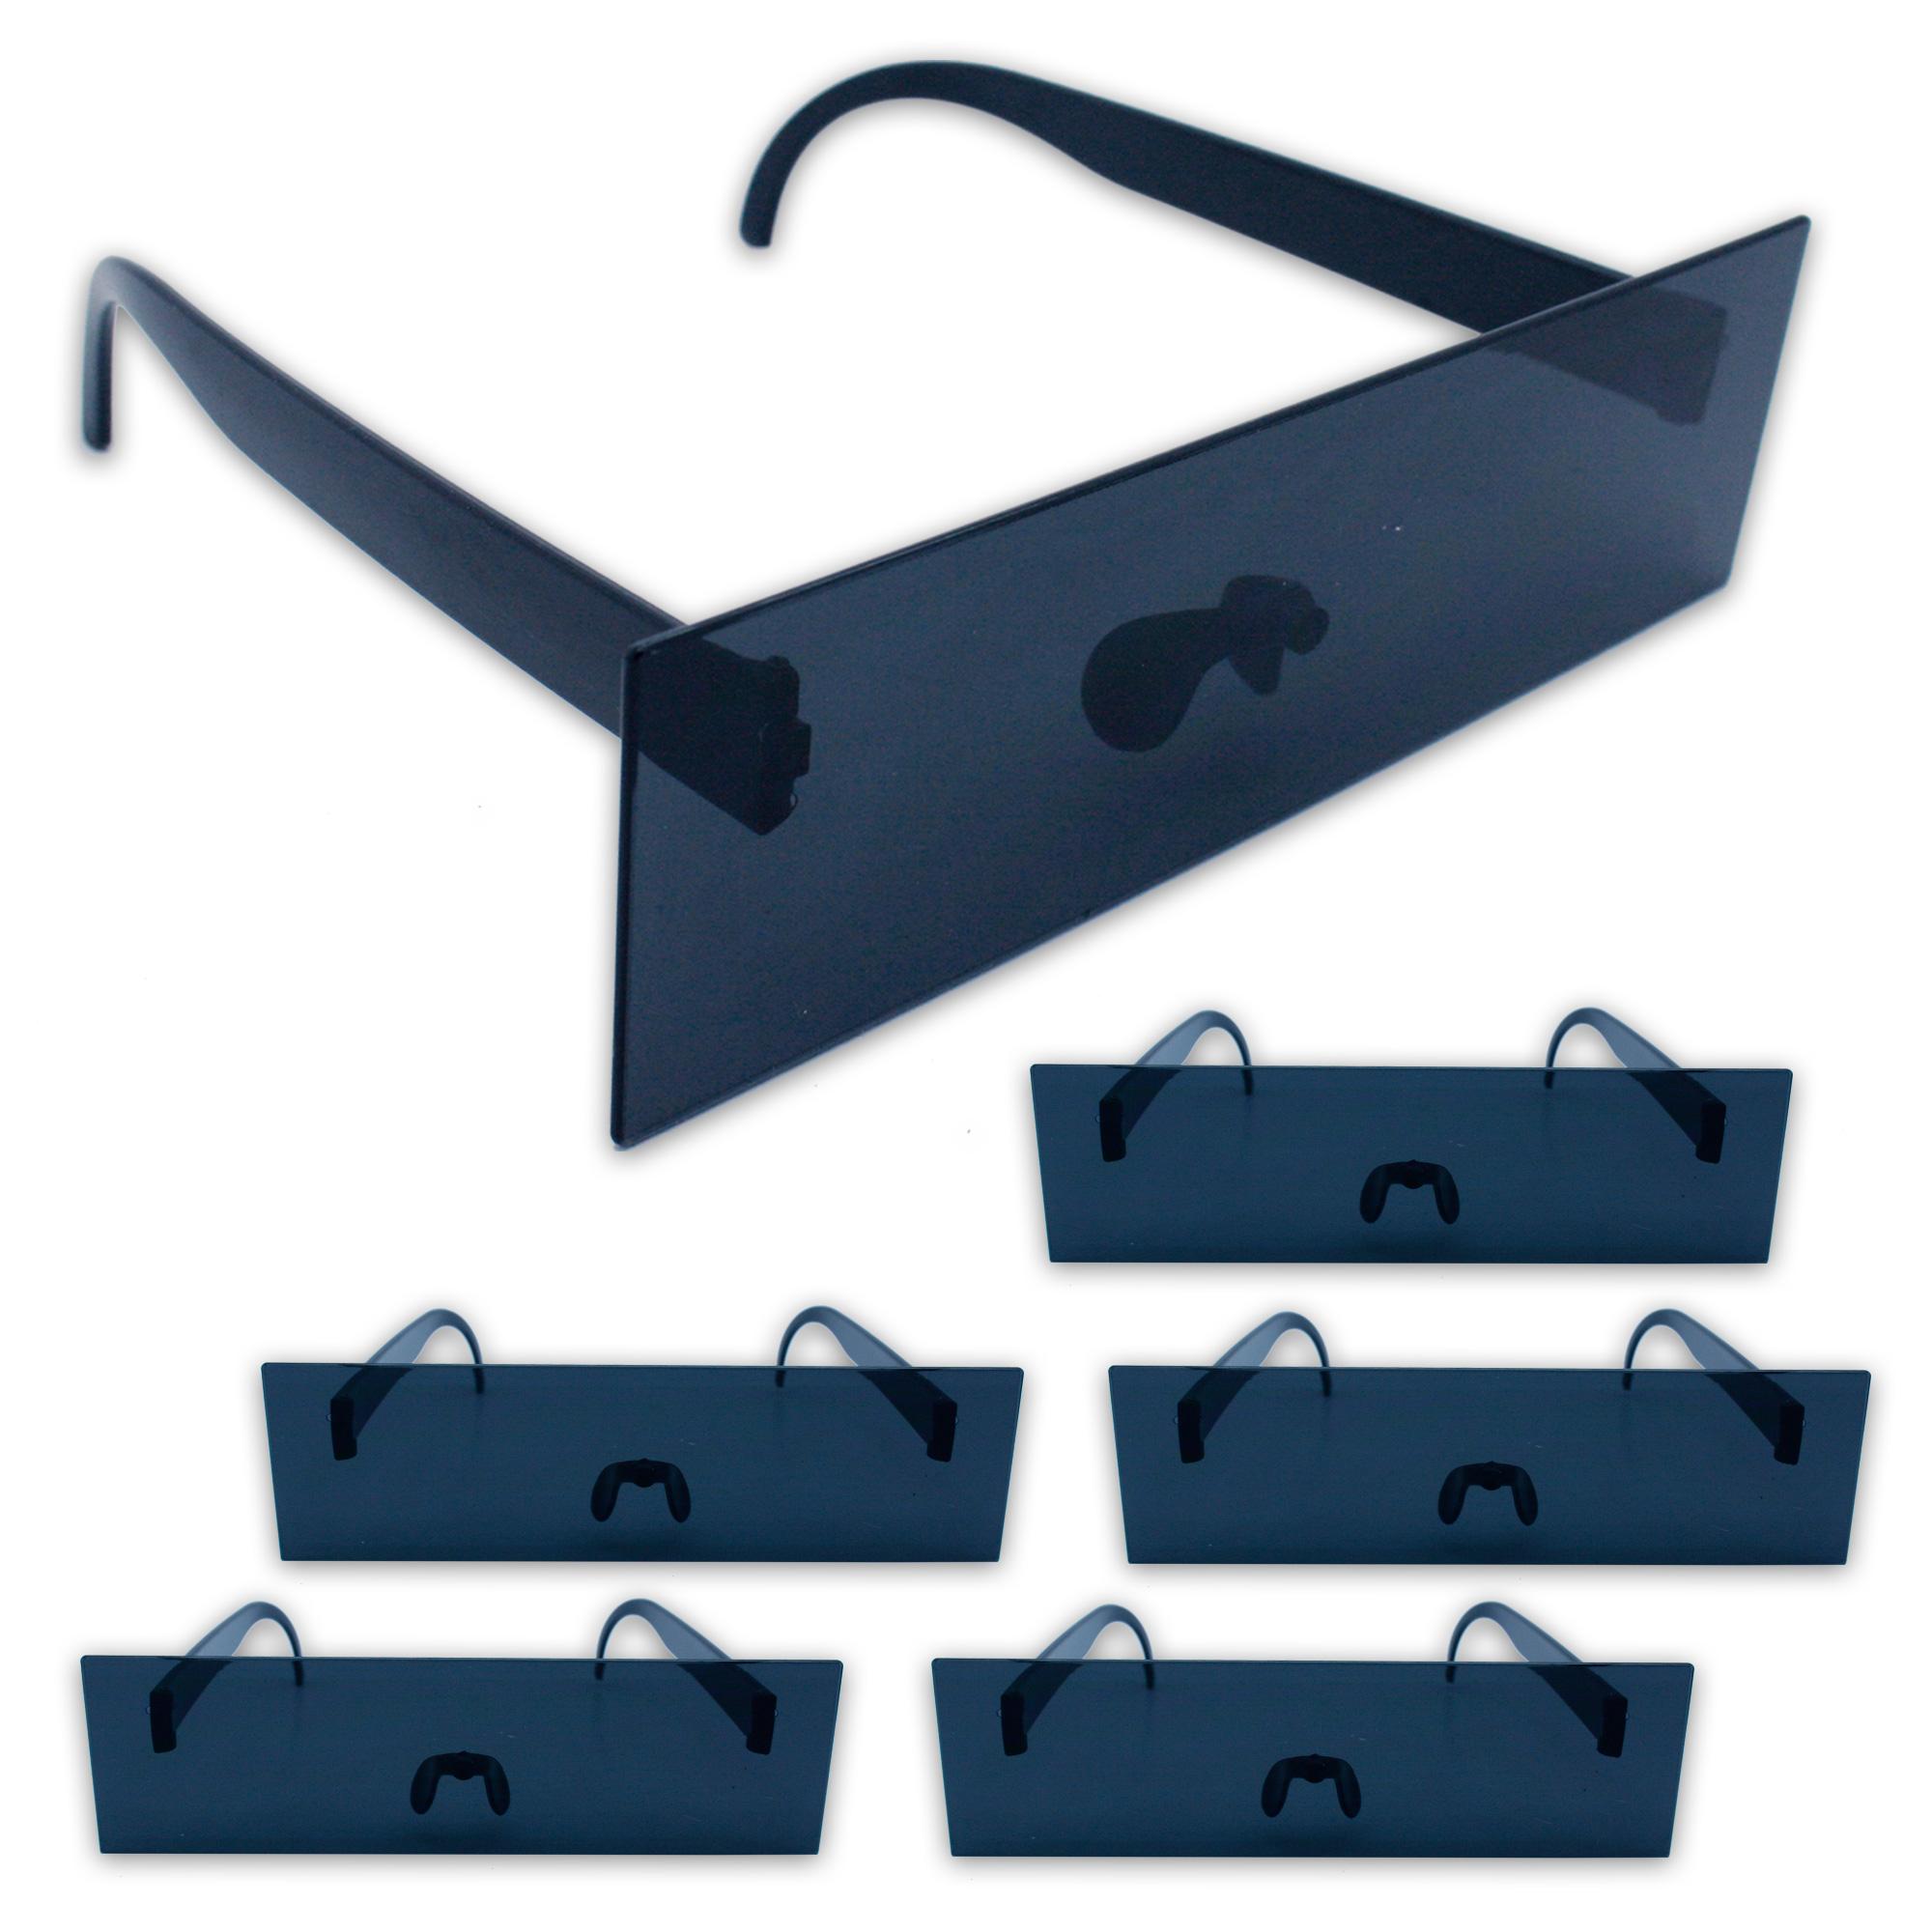 6 x balkenbrille partybrille scherzbrille gagbrille zensur. Black Bedroom Furniture Sets. Home Design Ideas